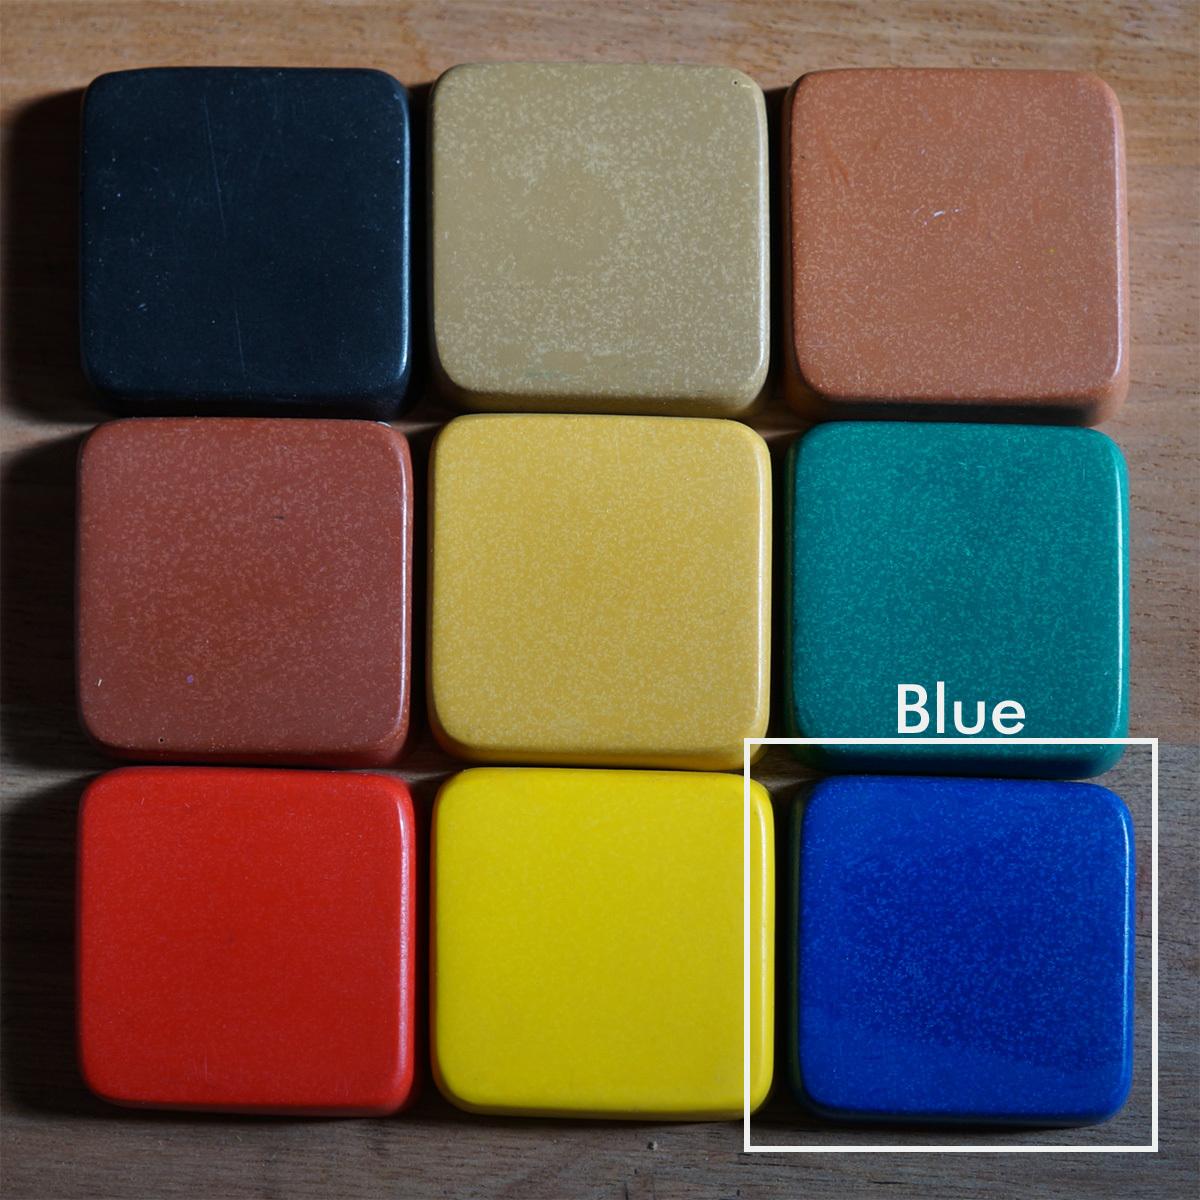 PIGMENT BLUE 1kg(着色剤:青 1kg) - 画像2